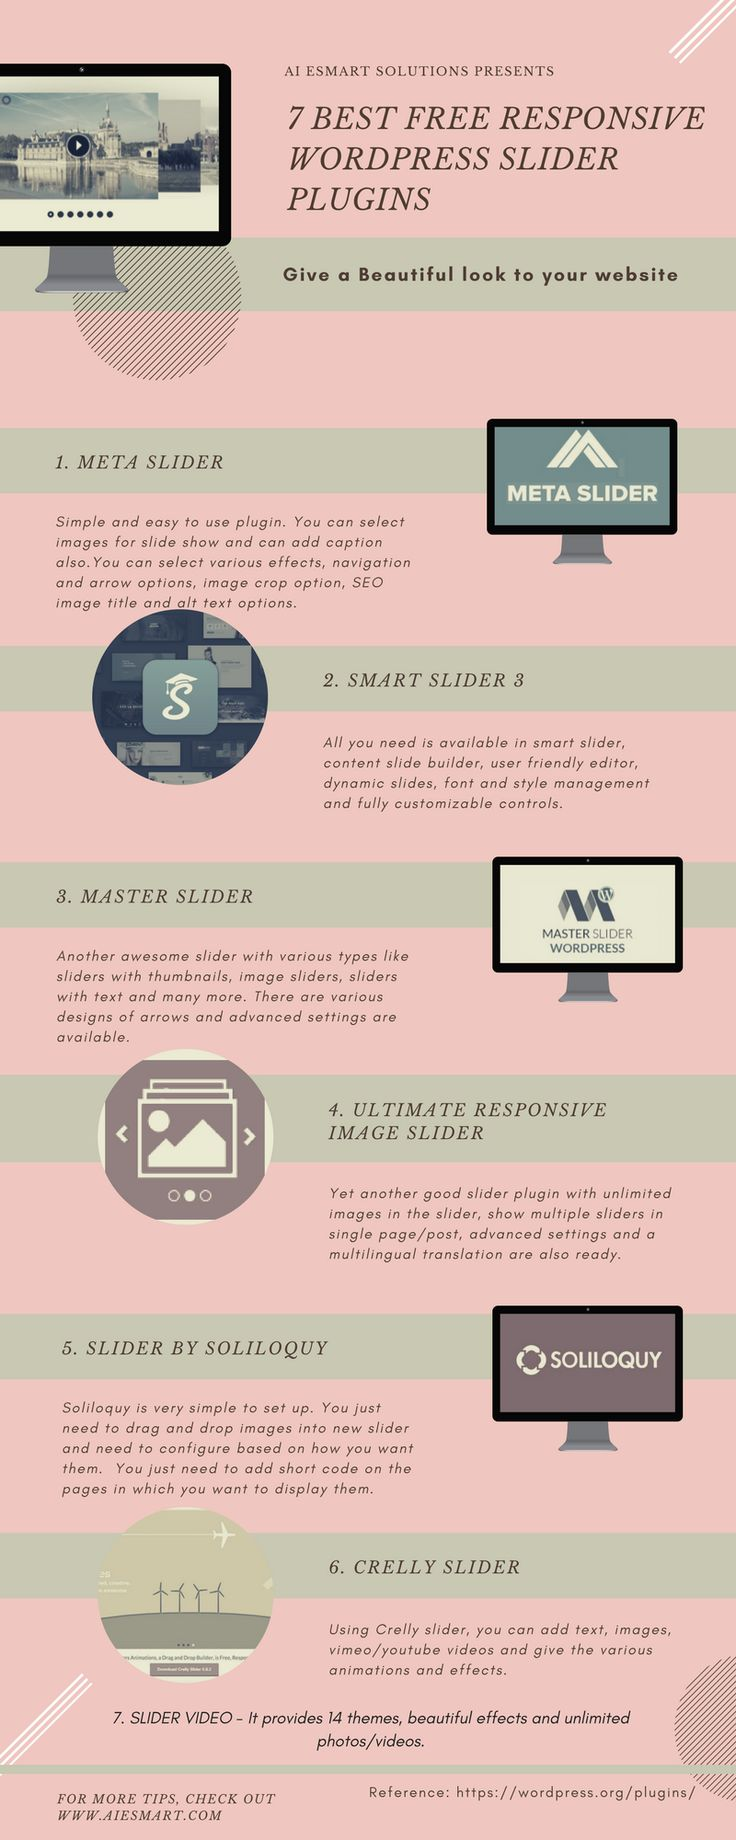 7 Best free Responsive WordPress Slider Plugins for WordPress Site Design